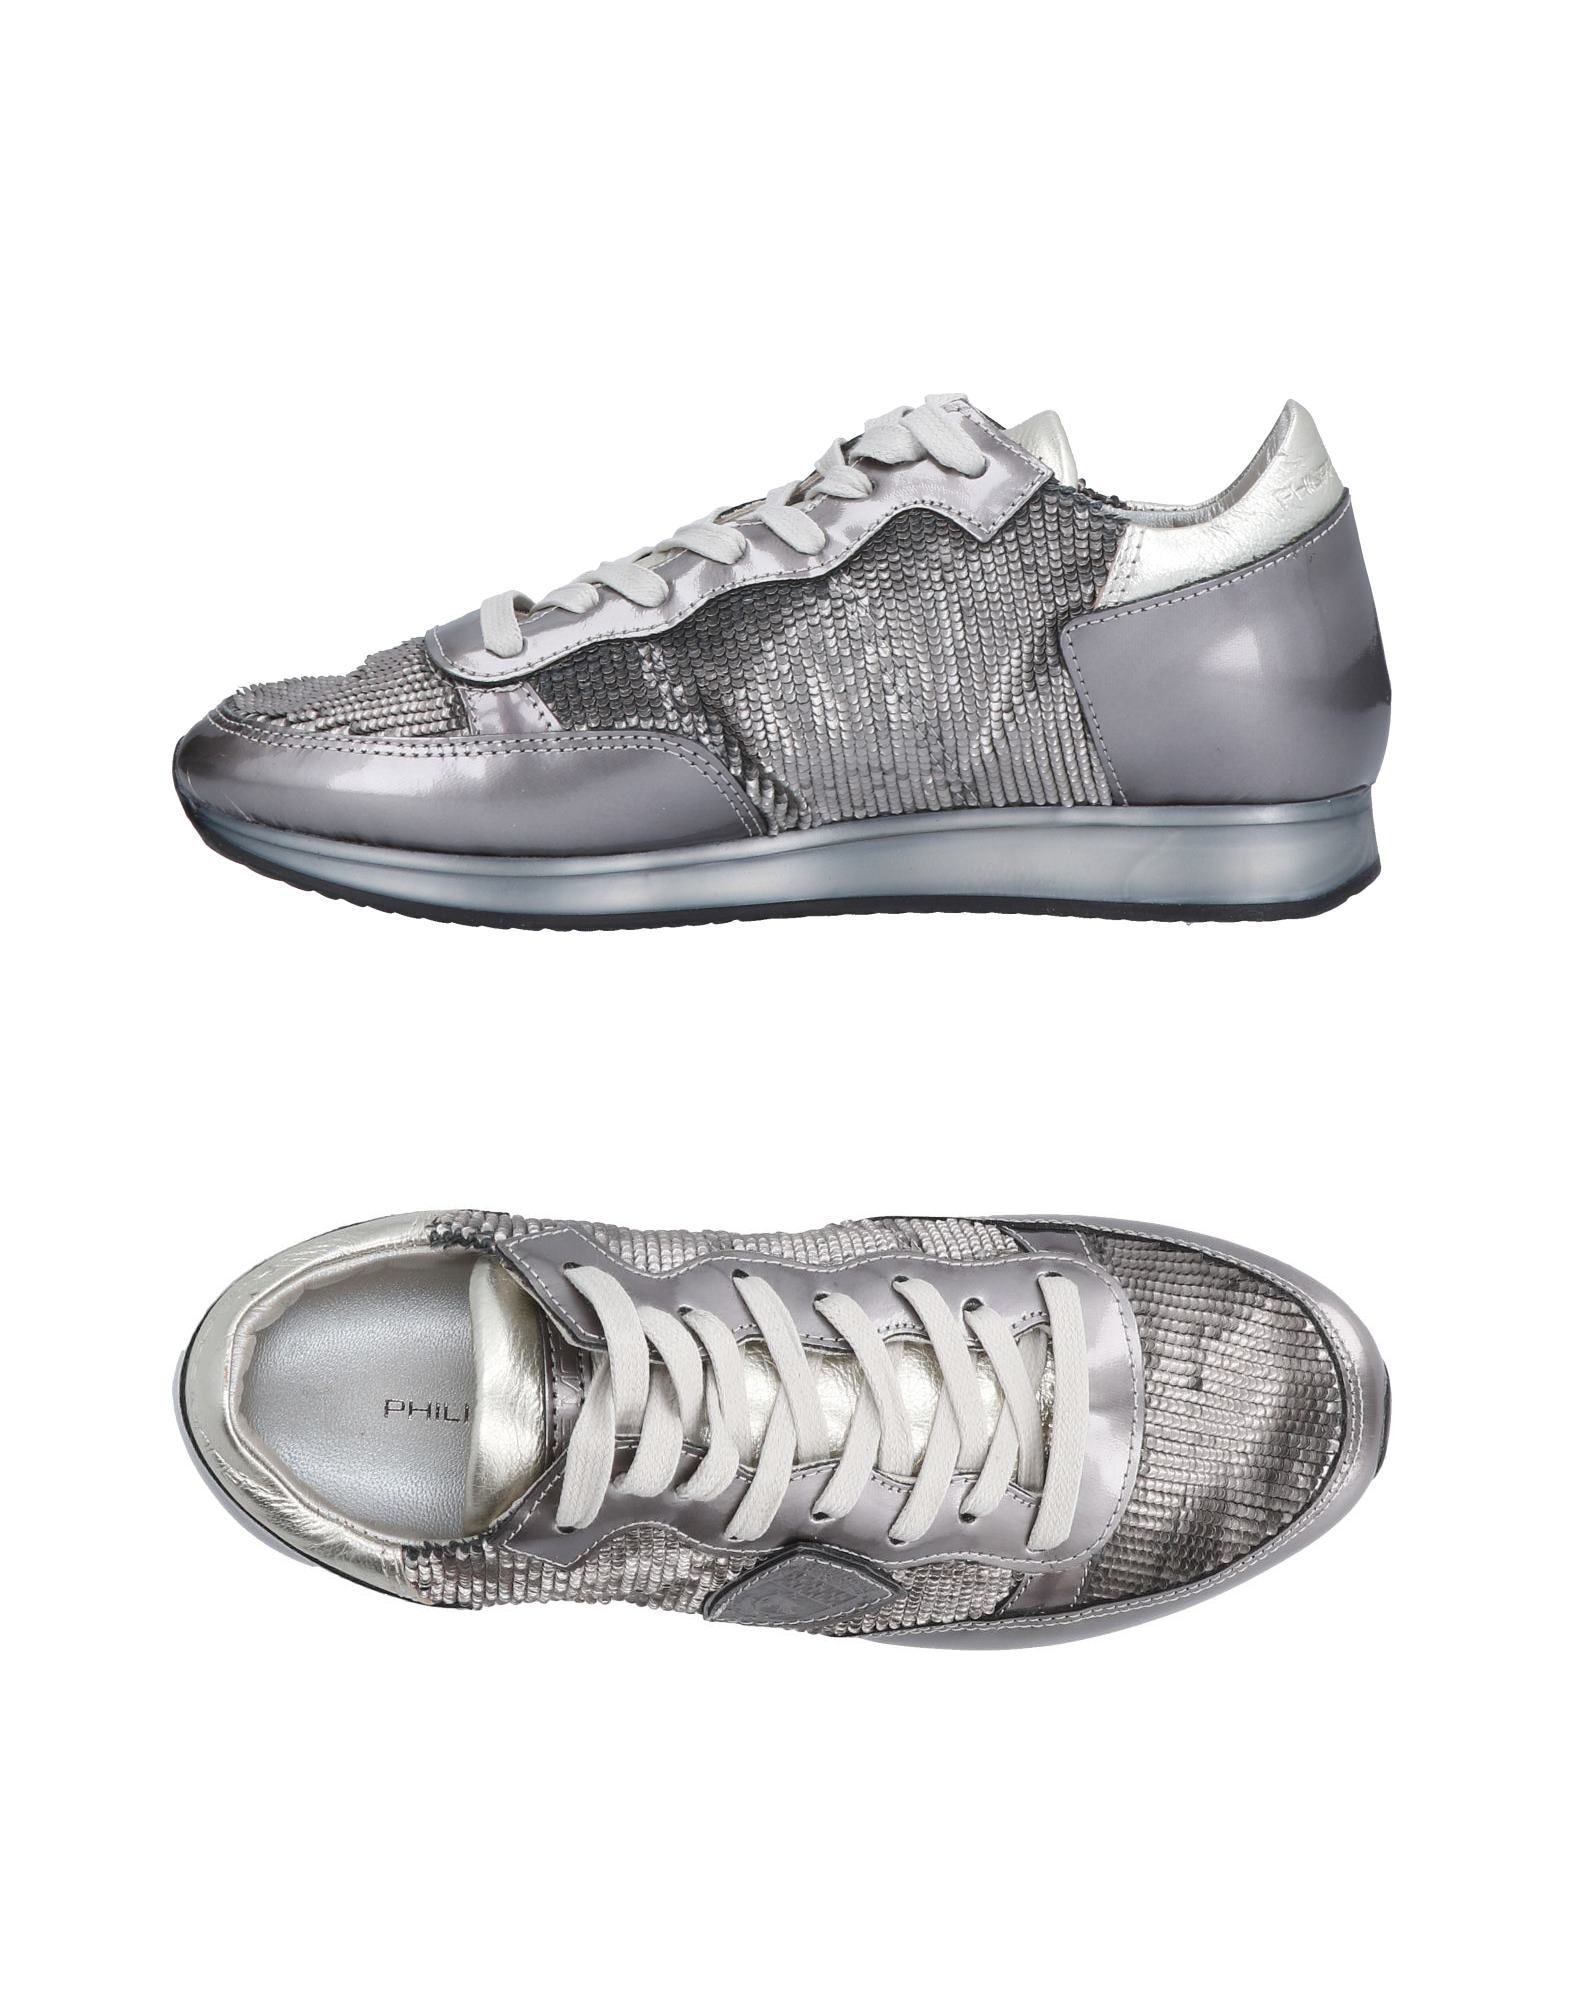 Baskets Philippe Model Femme - Baskets Philippe Model Plomb Chaussures femme pas cher homme et femme